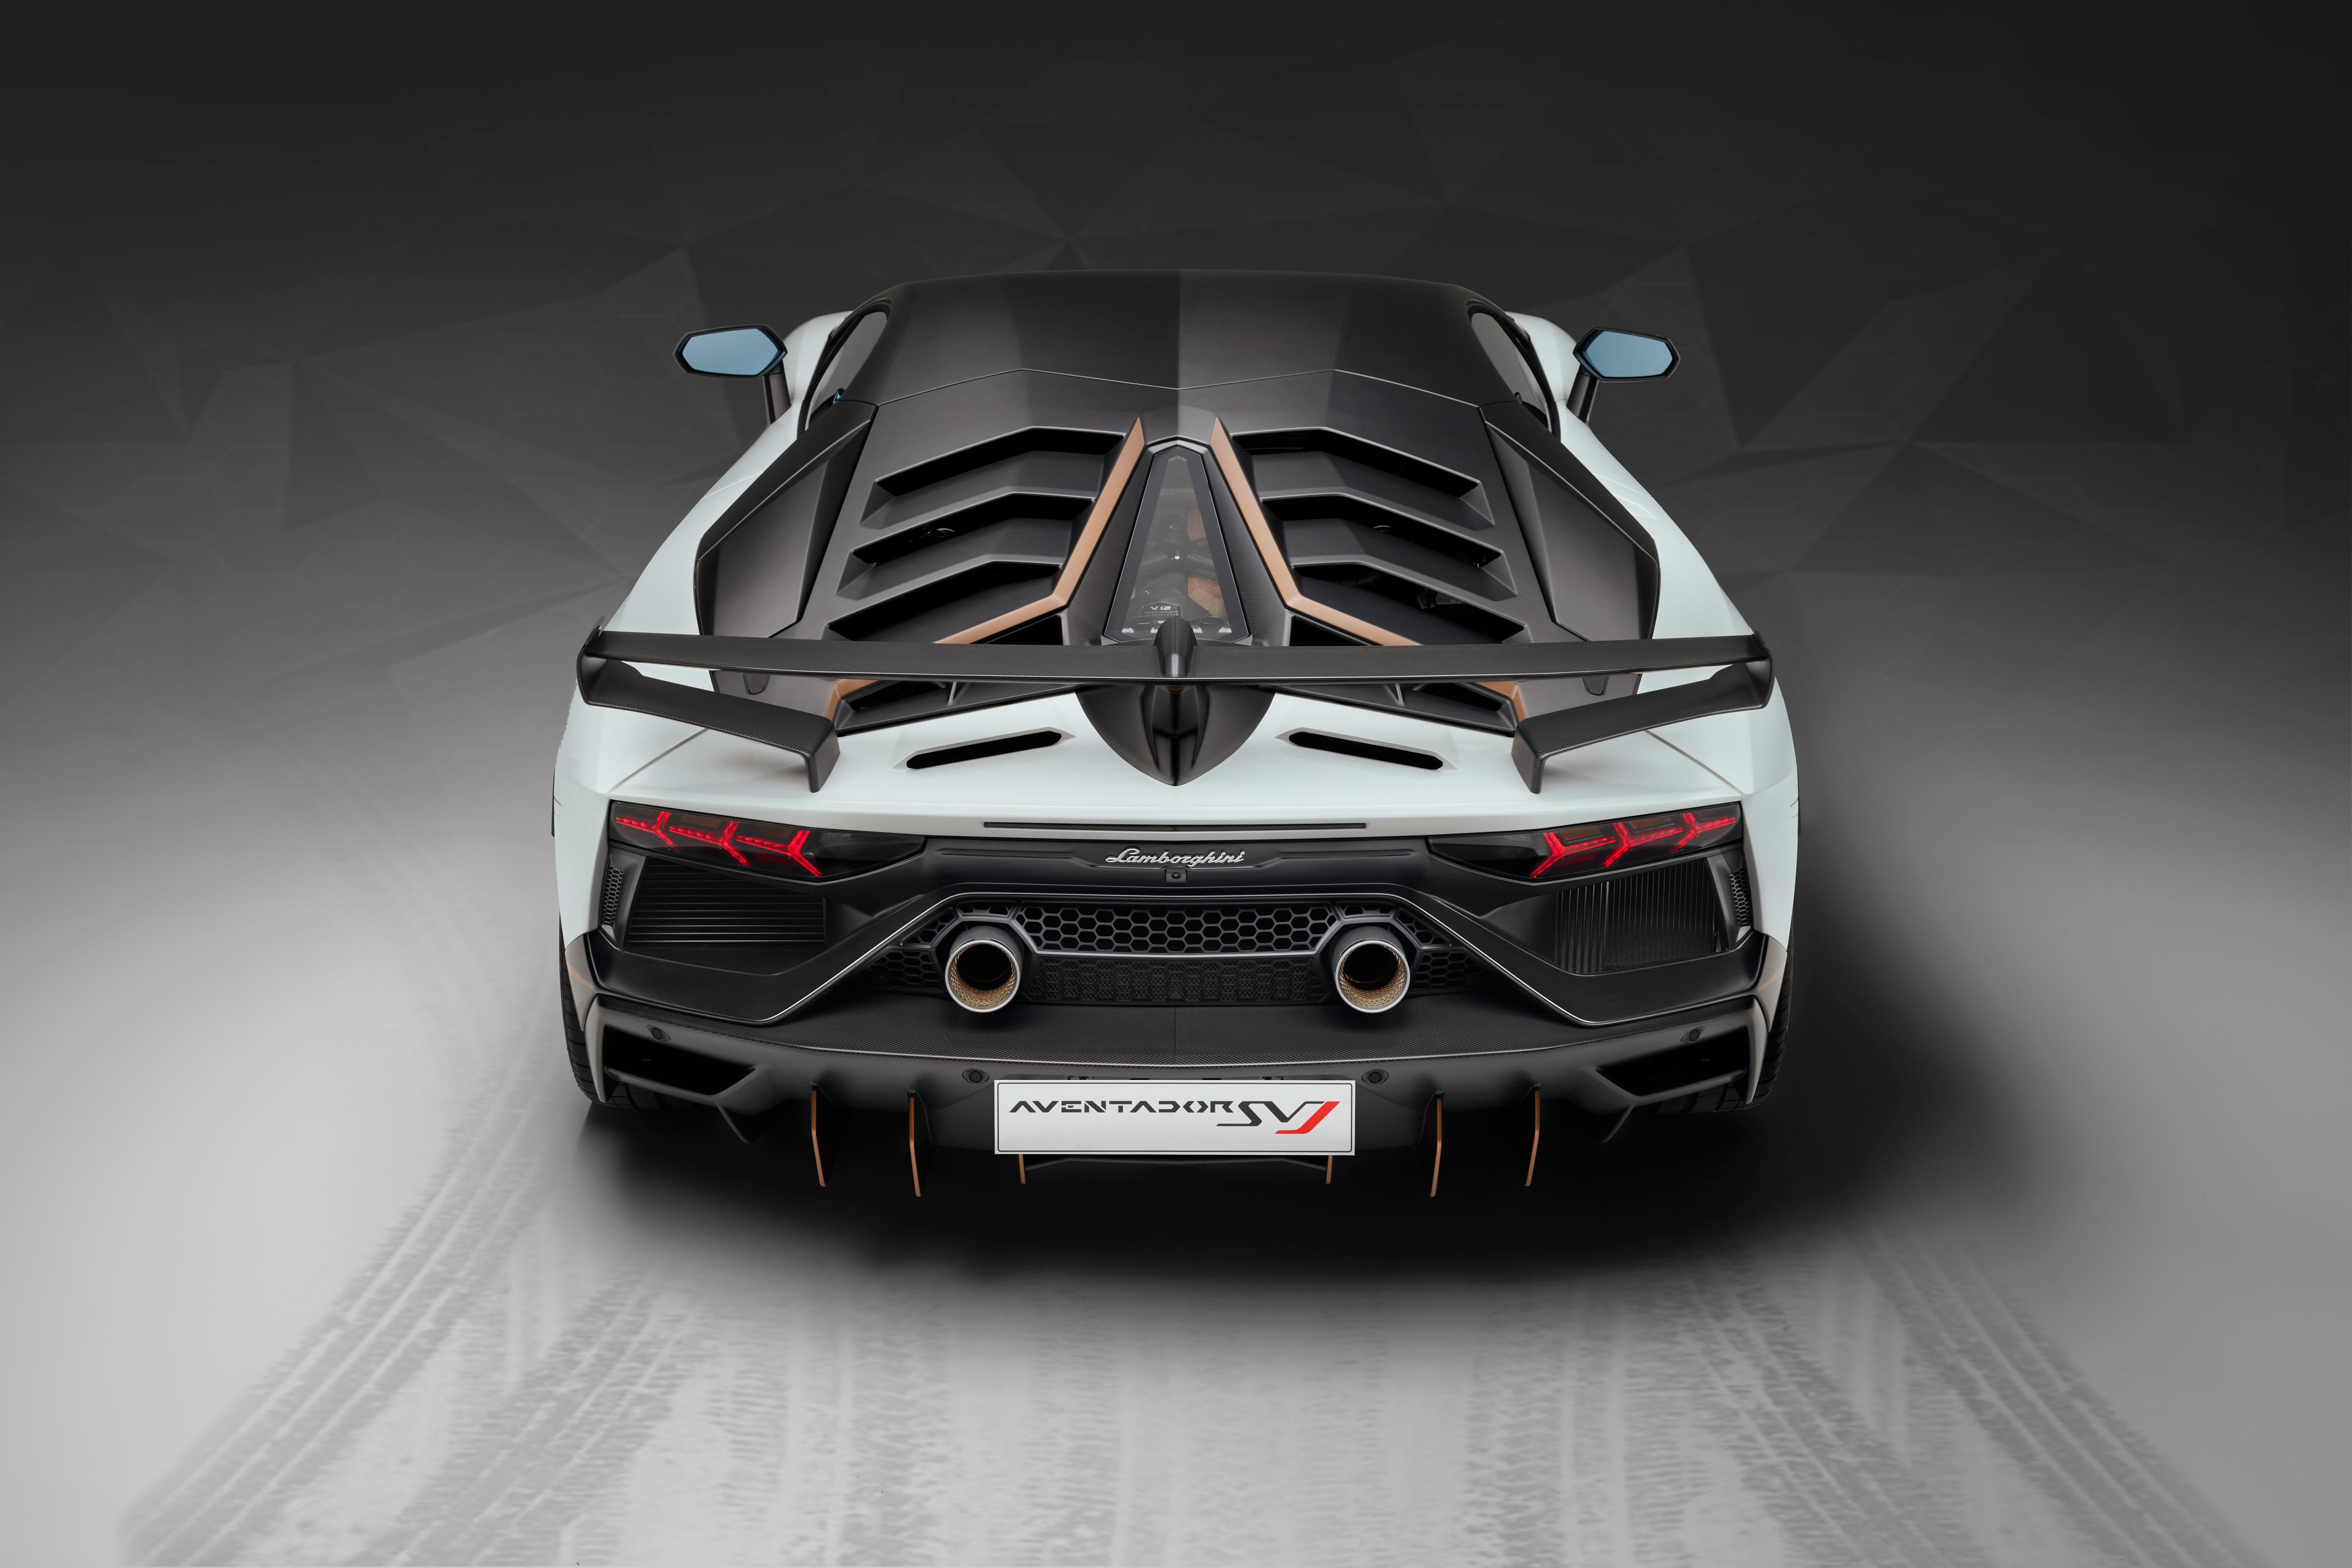 Lamborghini Aventador Svj 63 2018 Rear View Hd Cars 4k Wallpapers